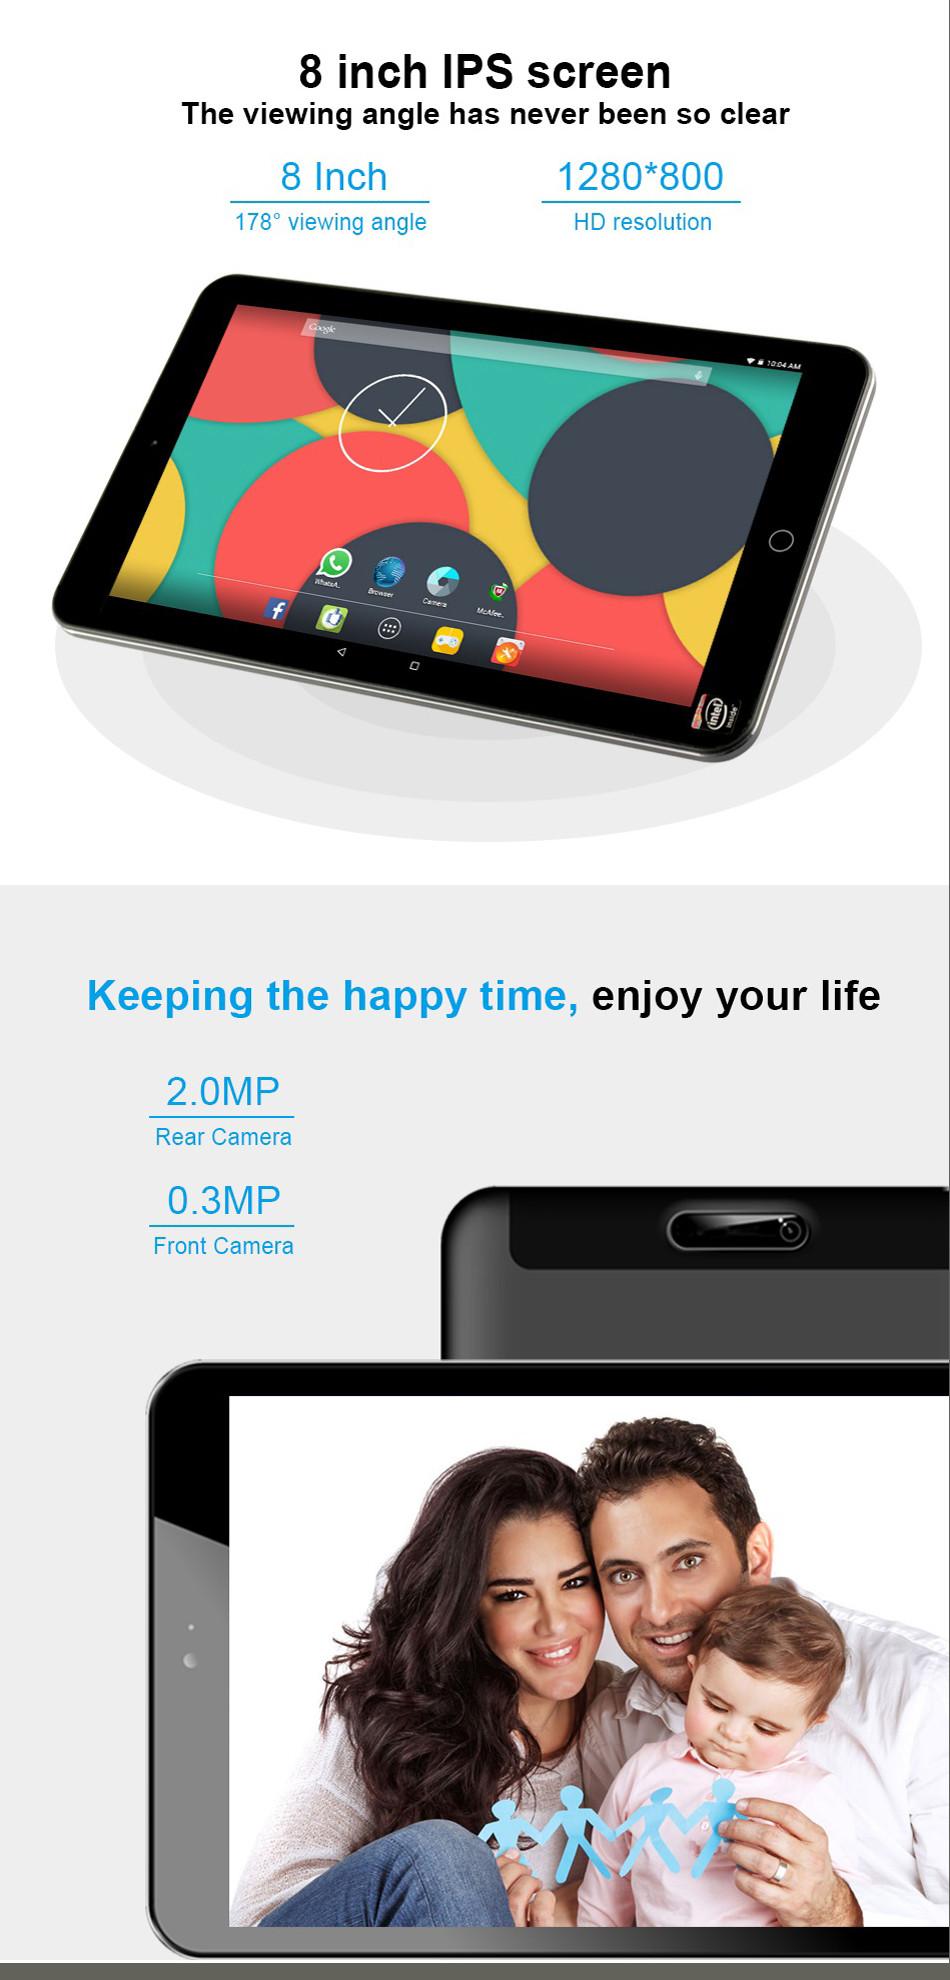 mitoo reeder android tablet pc tablette wifi tablets phablet cheapest tablete 8 ips tabletas. Black Bedroom Furniture Sets. Home Design Ideas